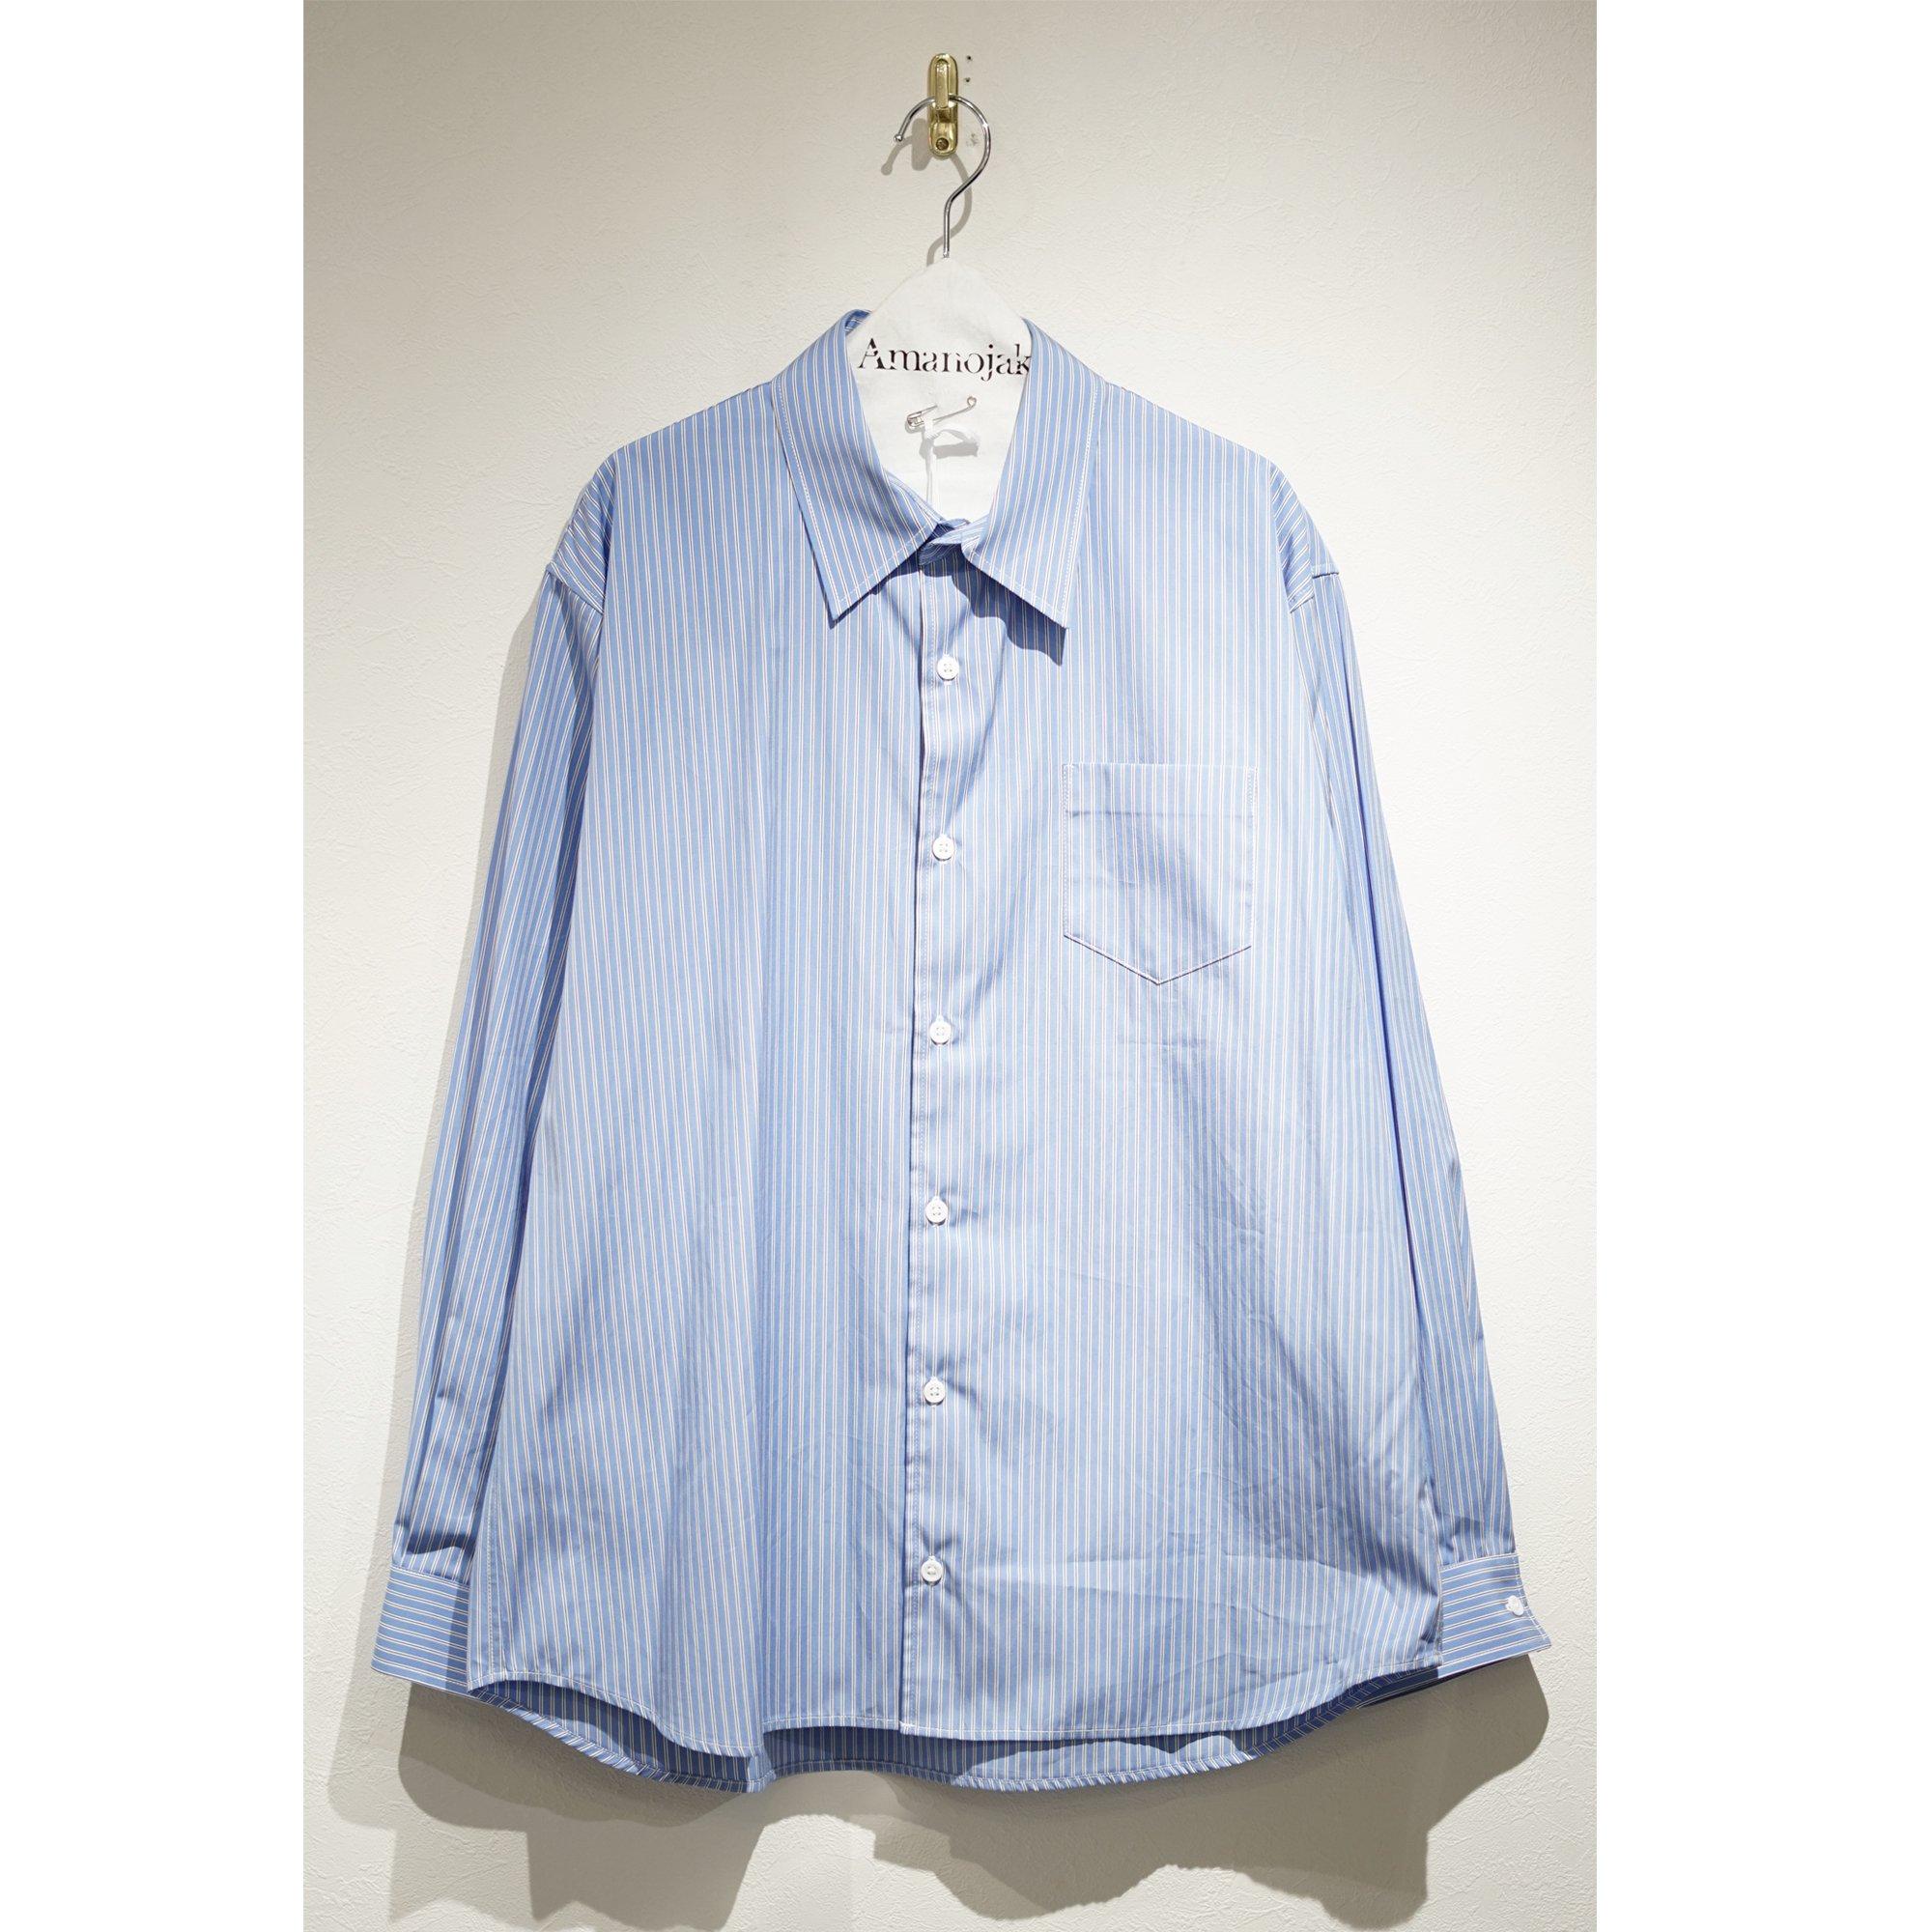 [Milok]-THE SHIRT BLUE STRIPE【THOMAS MASON FABRIC 】